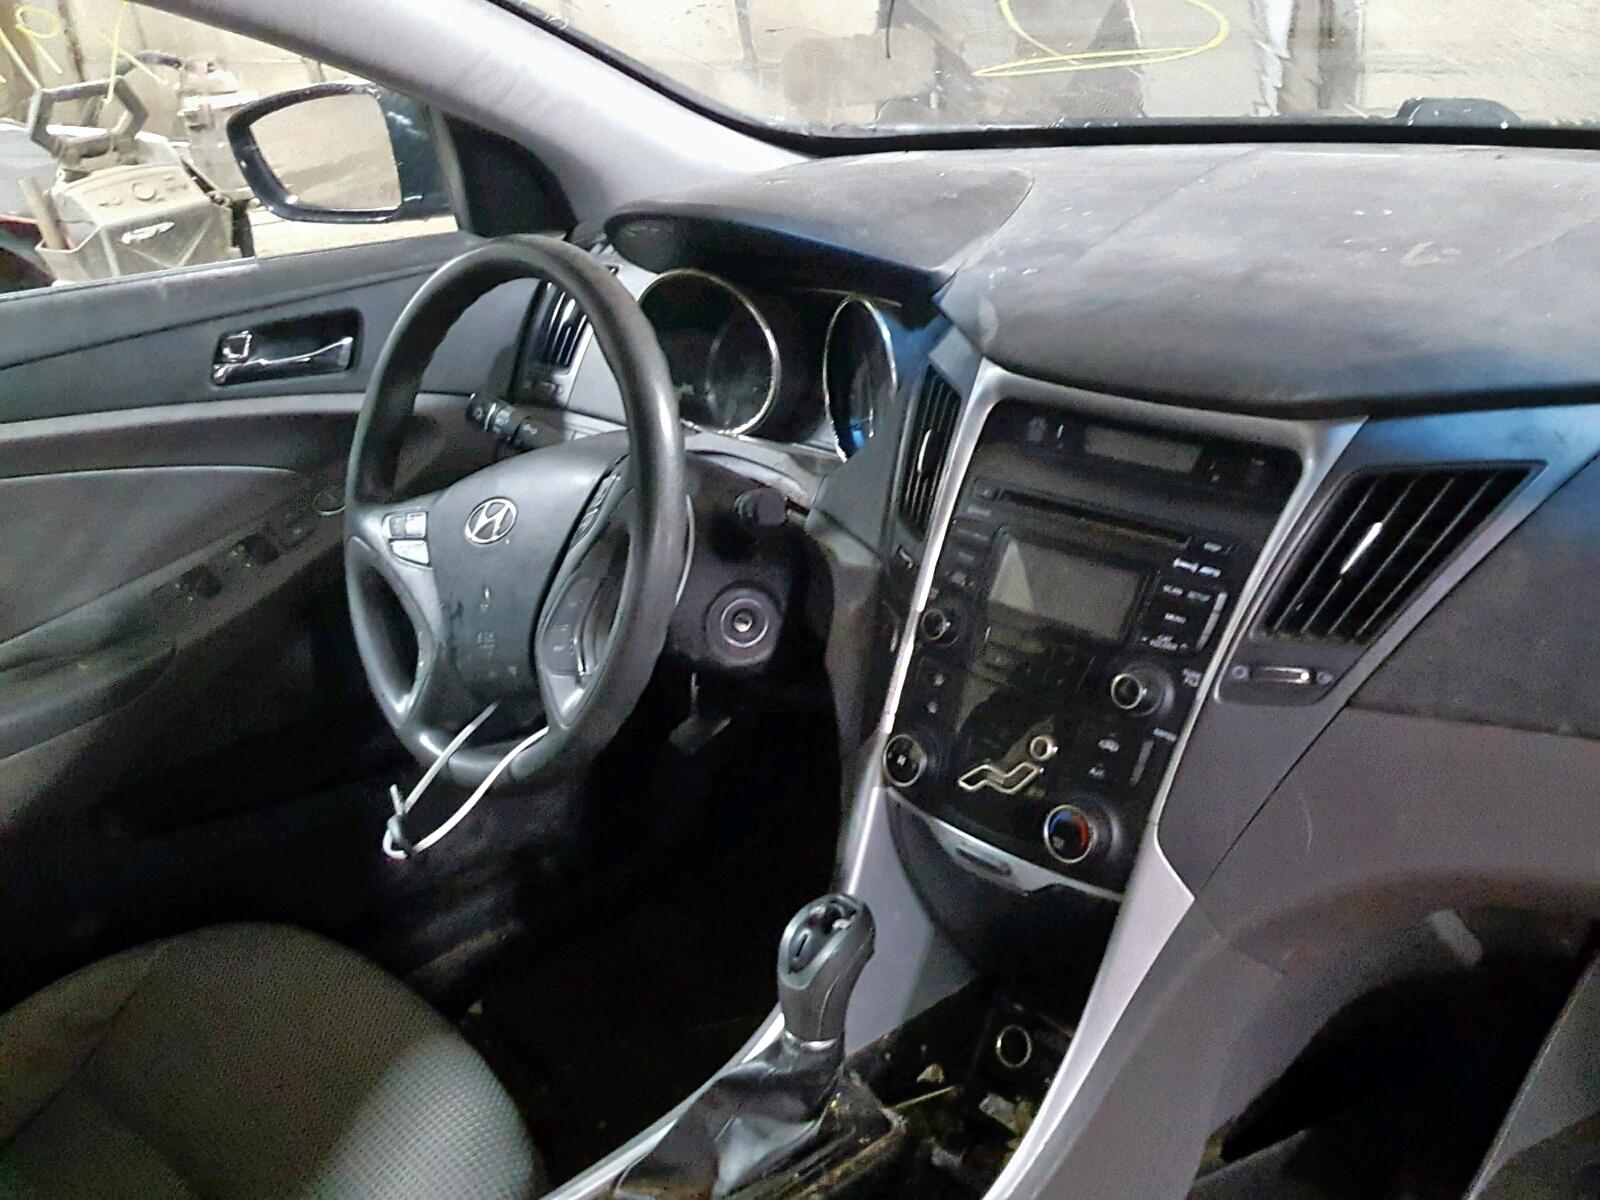 2013 Hyundai Sonata Gls 2.4L engine view